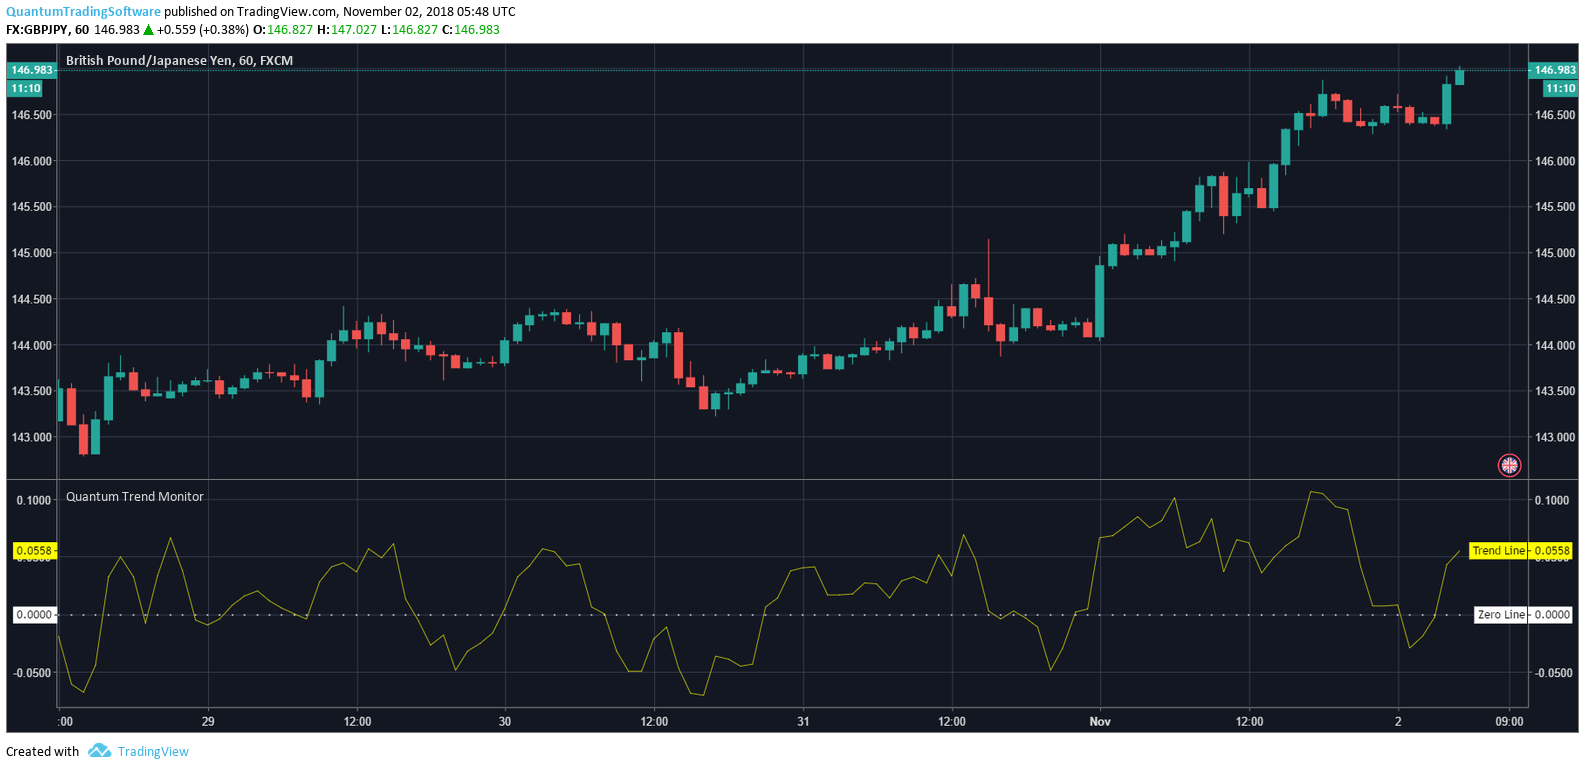 Configuring the Trend Monitor Indicator for TradingView – Quantum